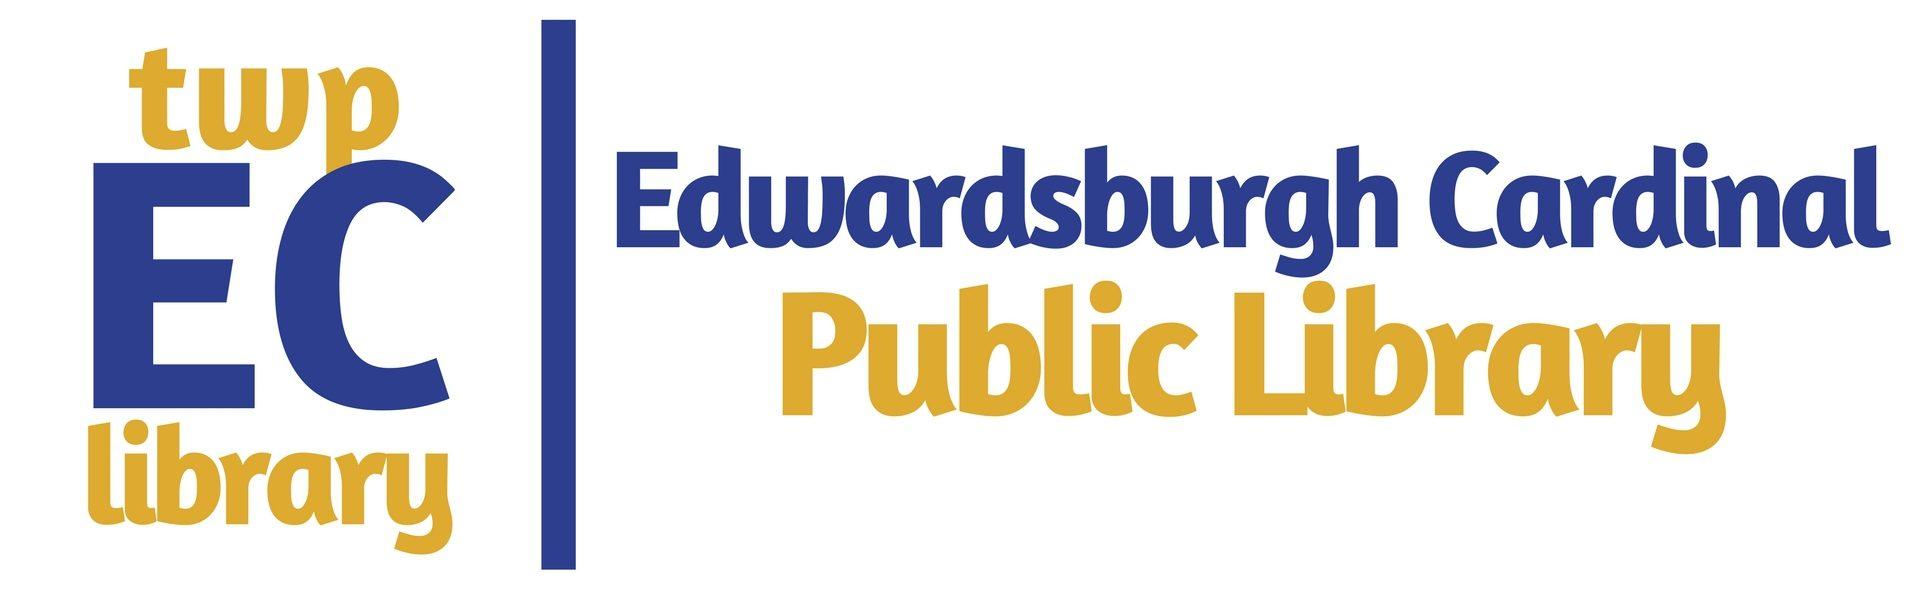 Edwardsburgh Cardinal Public Library